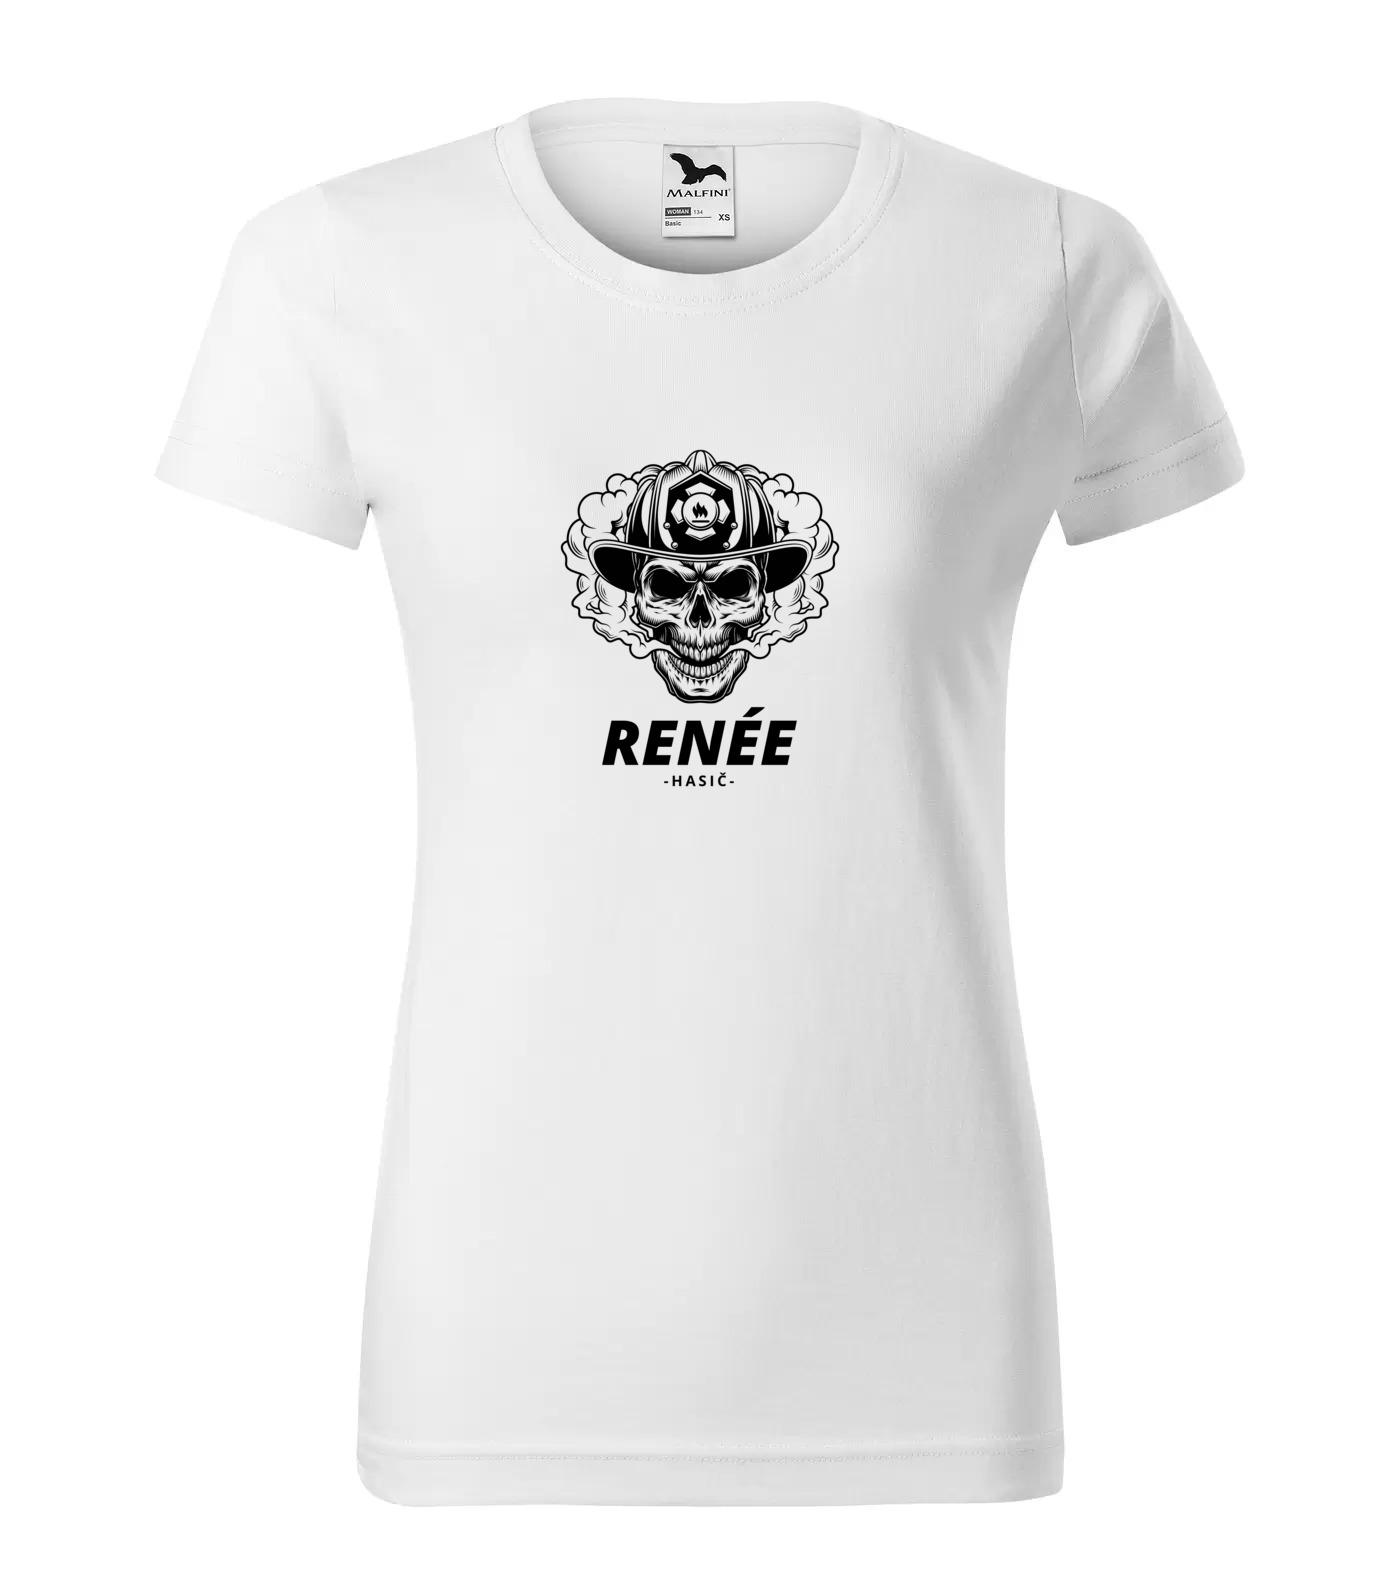 Tričko Hasič Renée